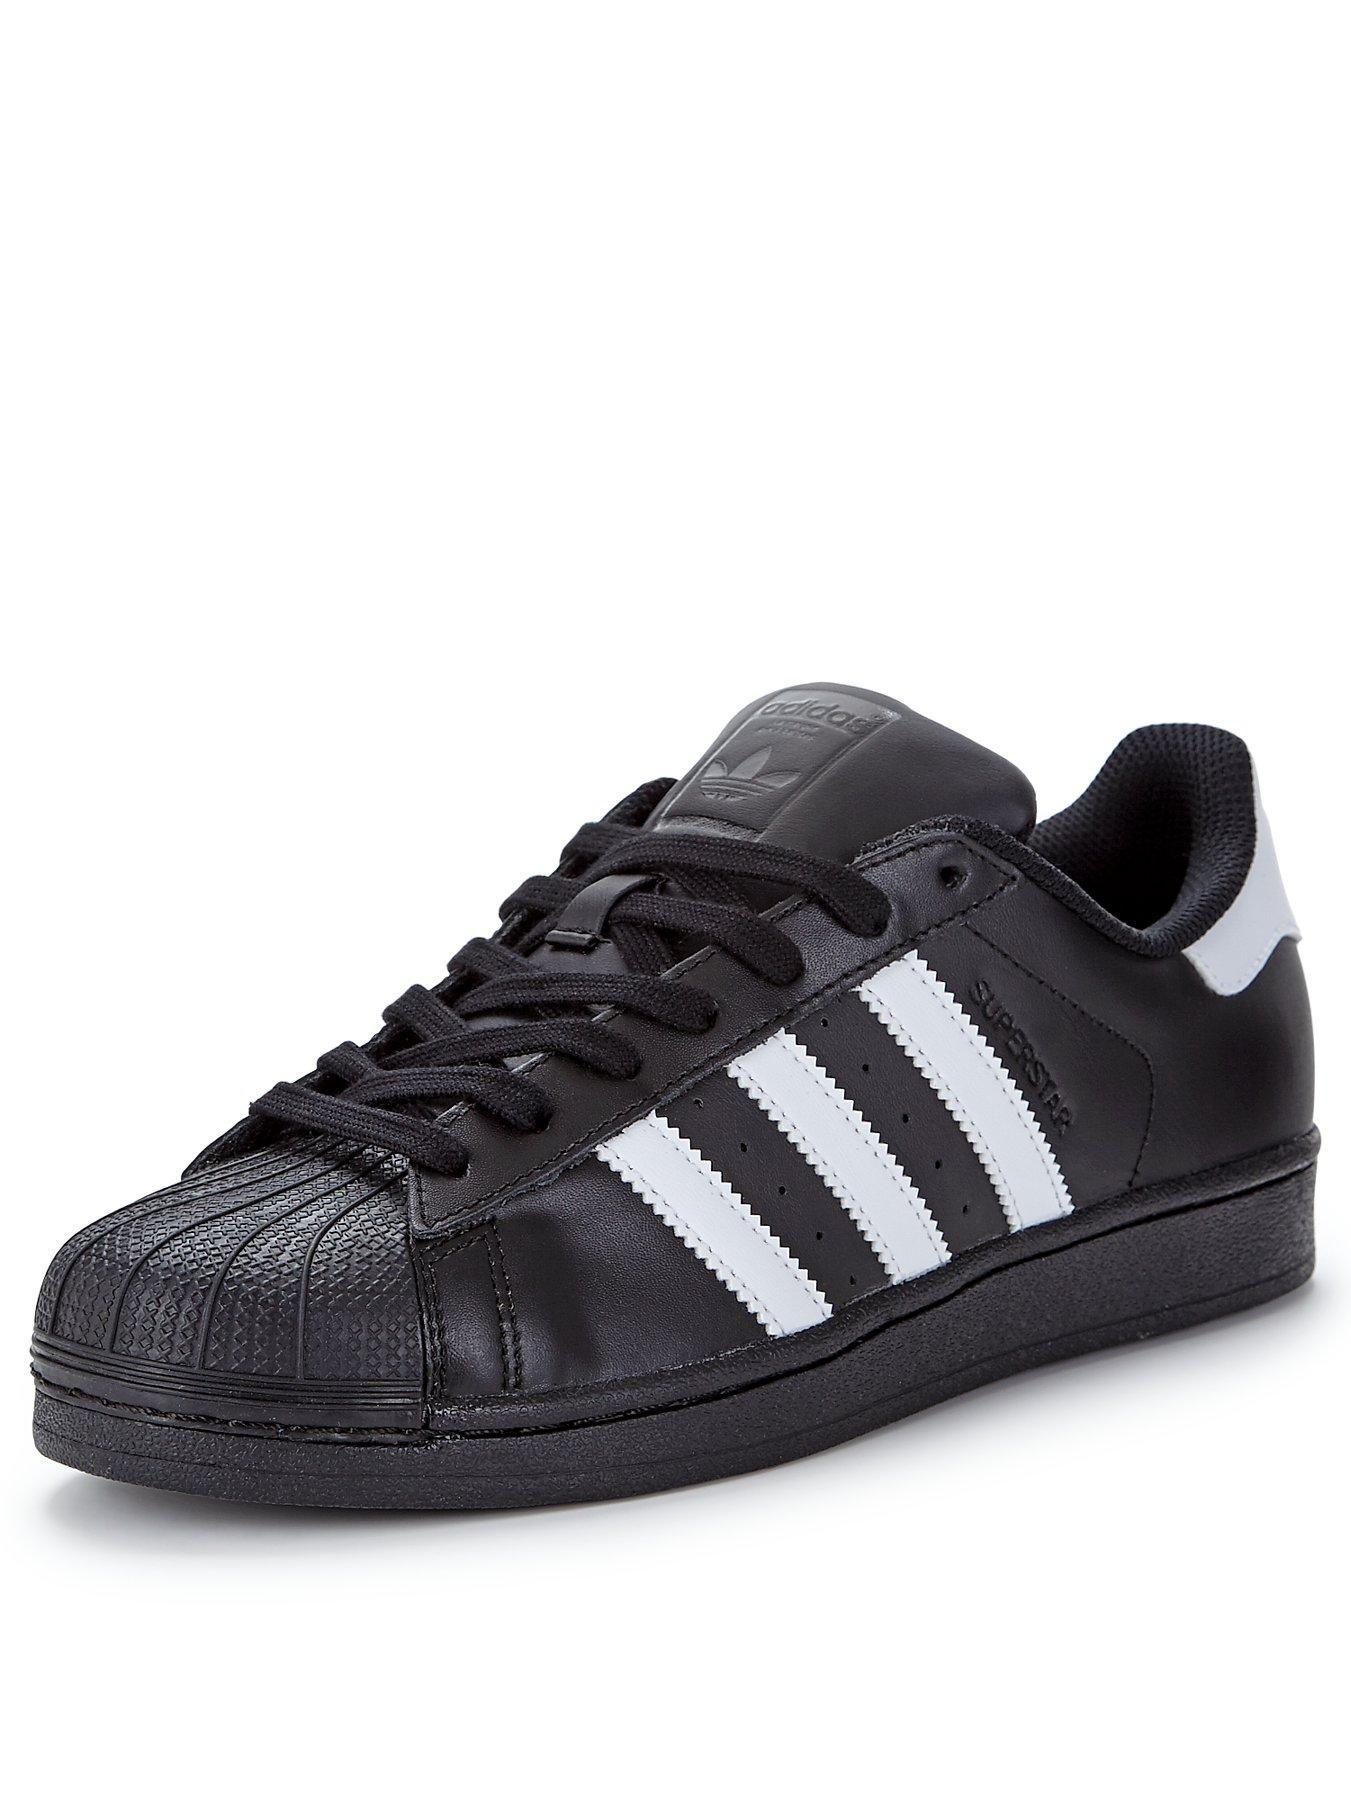 detailed look db50b 4c118 ... ebay adidas springblade mens shoes color dark blue d6697 b2e82